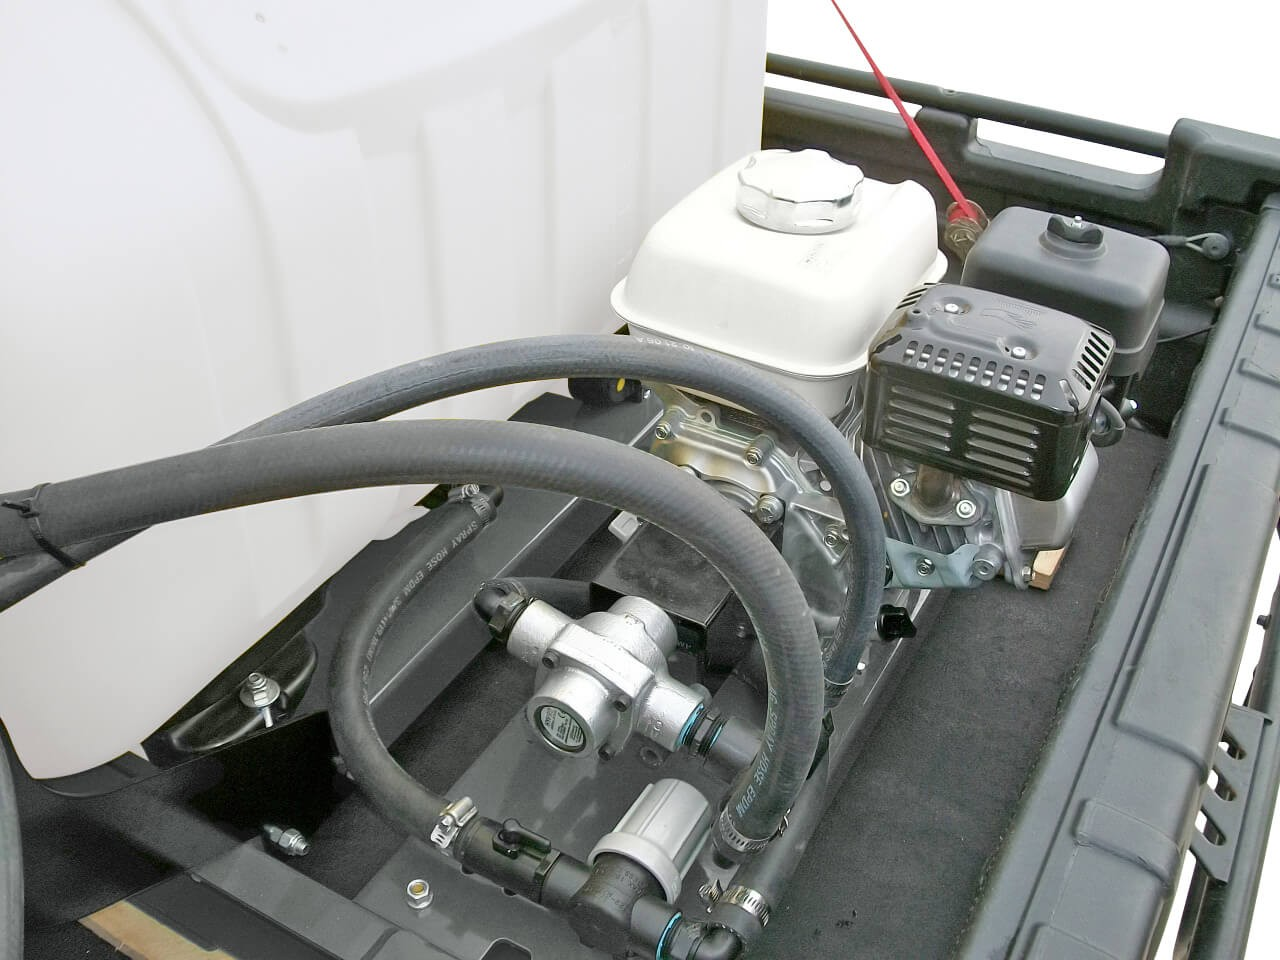 100 Gallon Gas UTV Sprayer